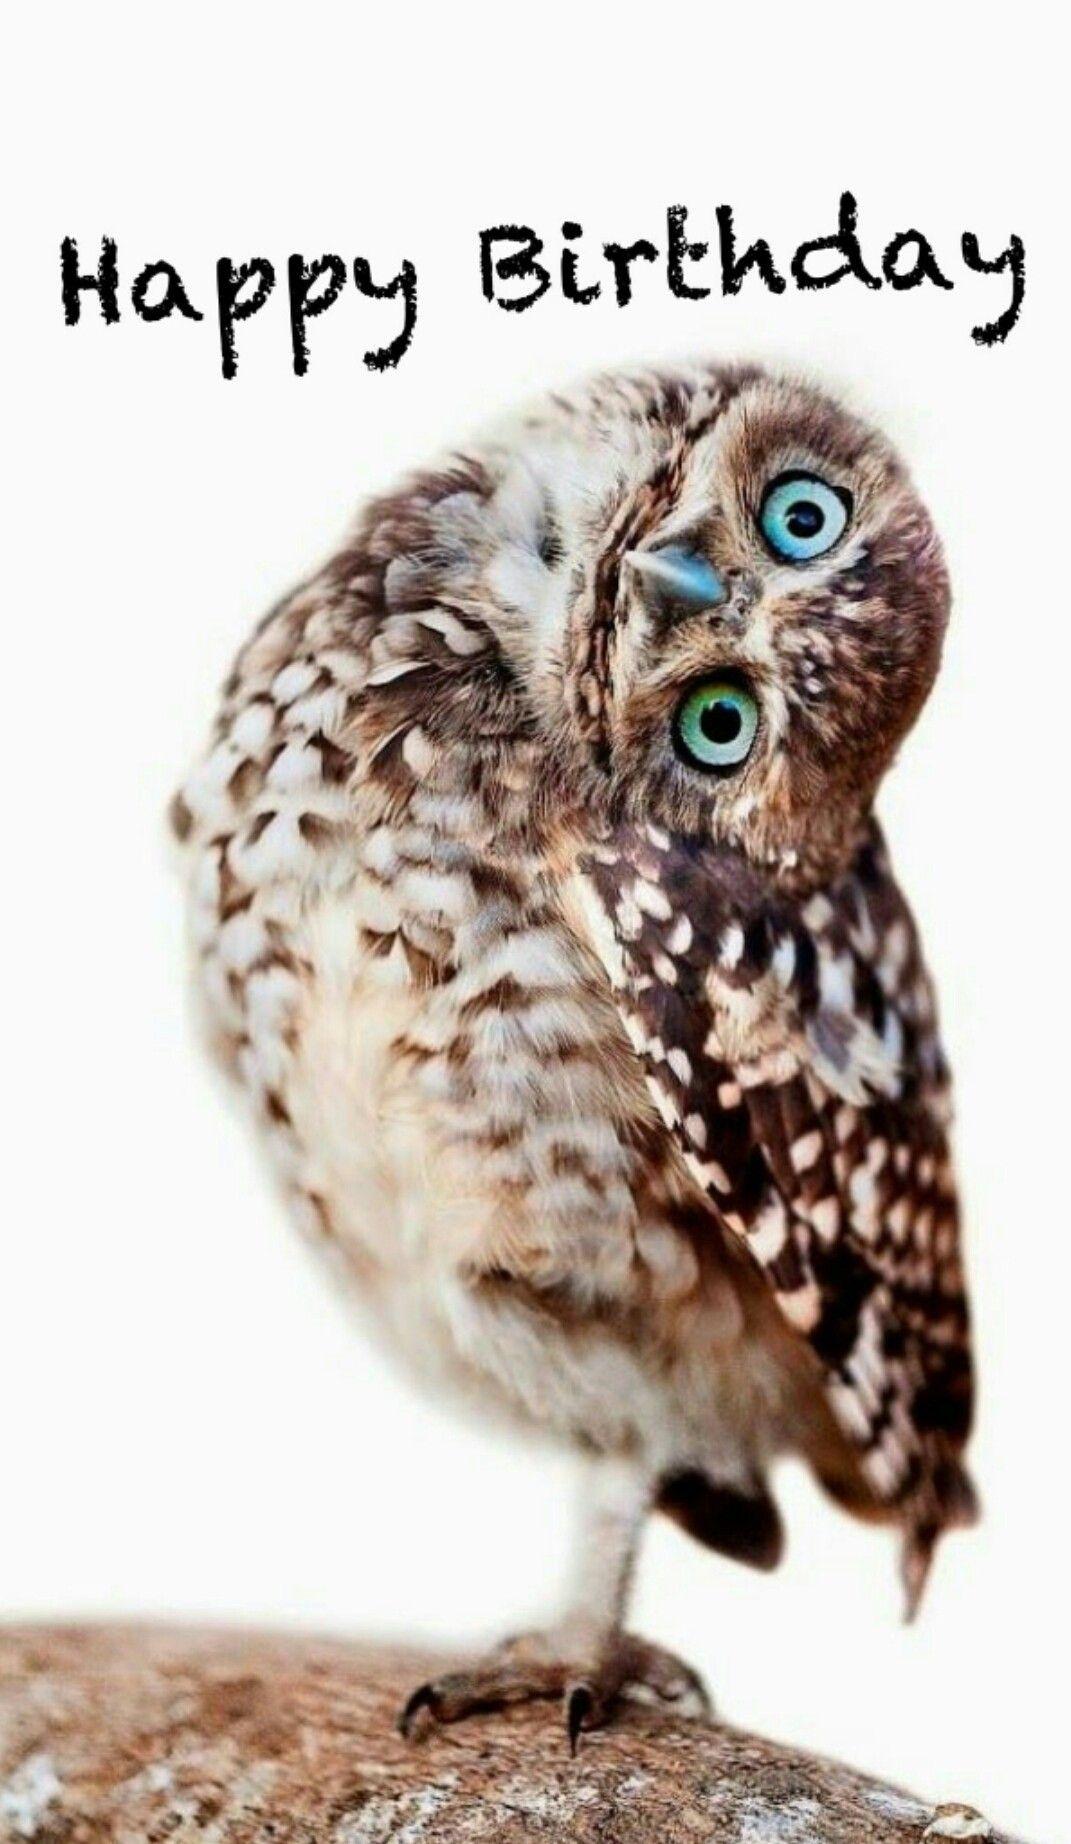 Pin By Terri Taylor On Greetings Quotes More Happy Birthday Owl Birthday Meme Birthday Humor